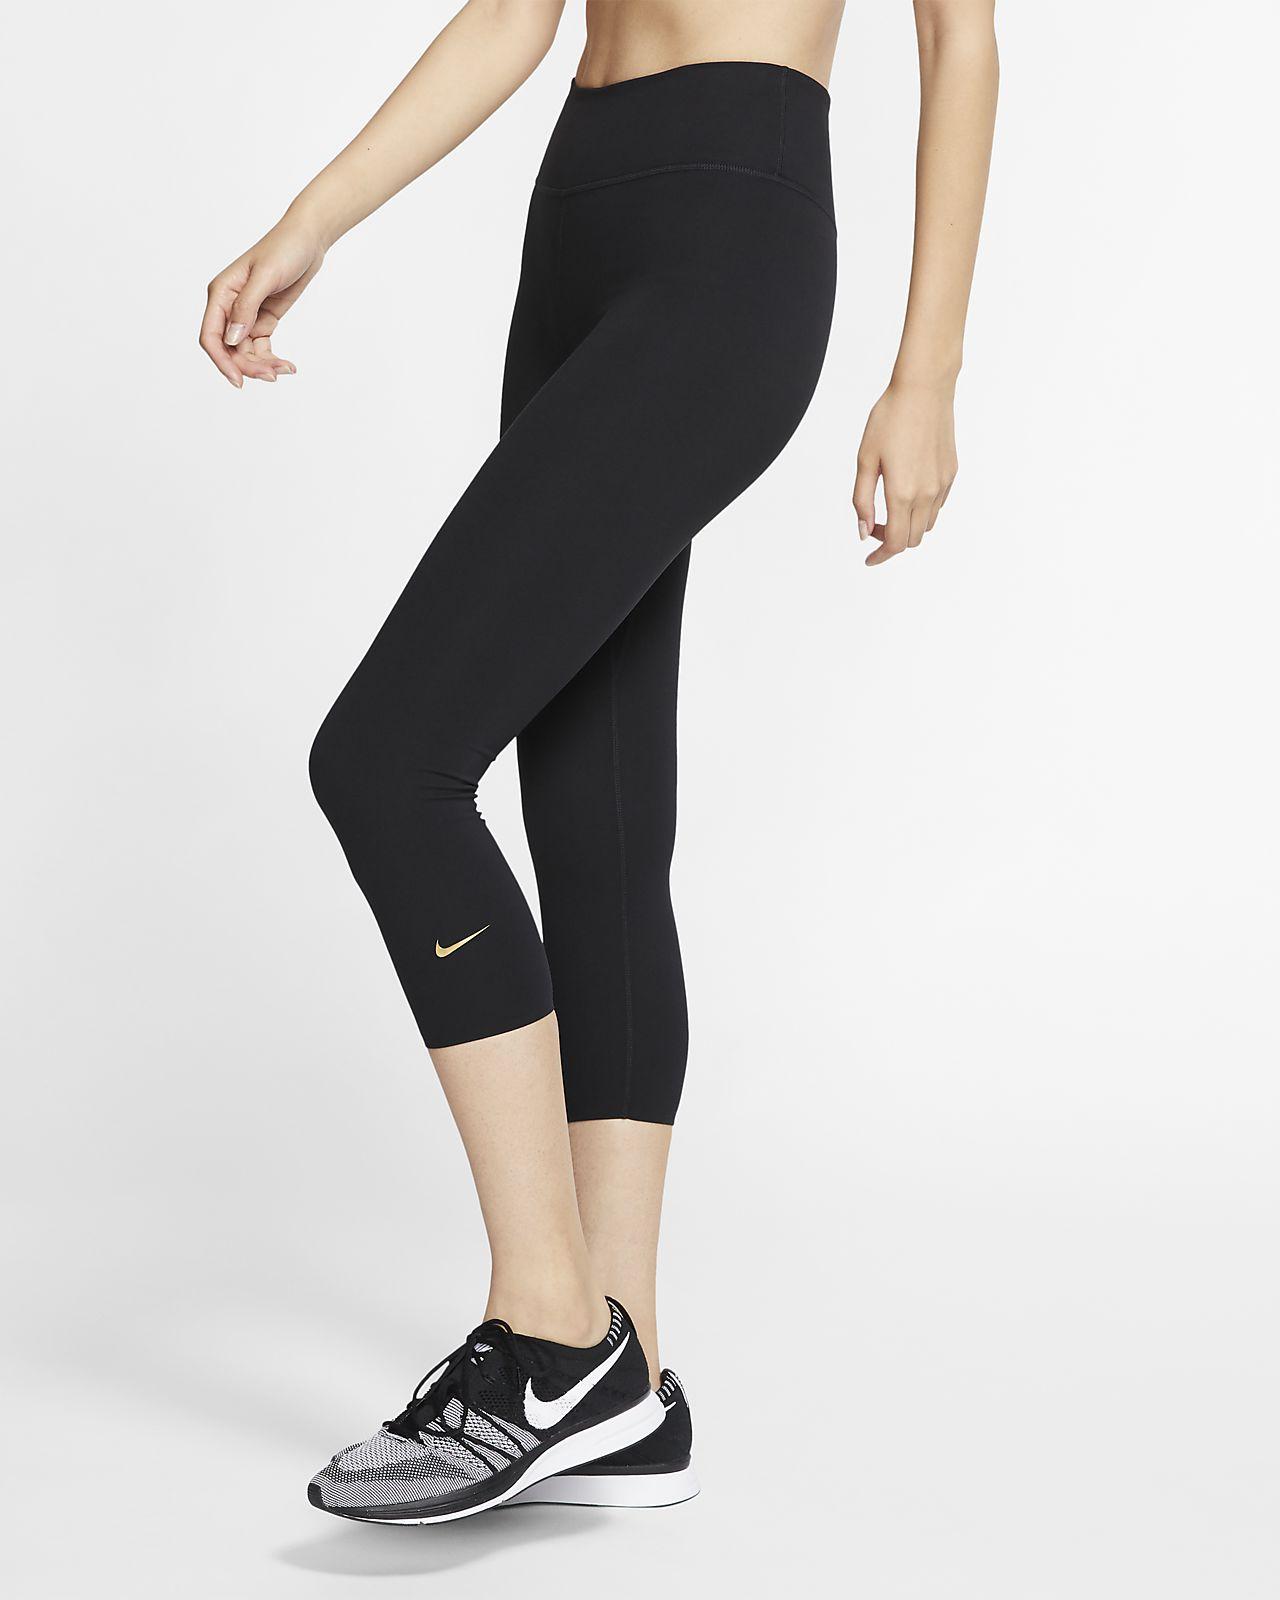 Corsários Nike One Luxe para mulher